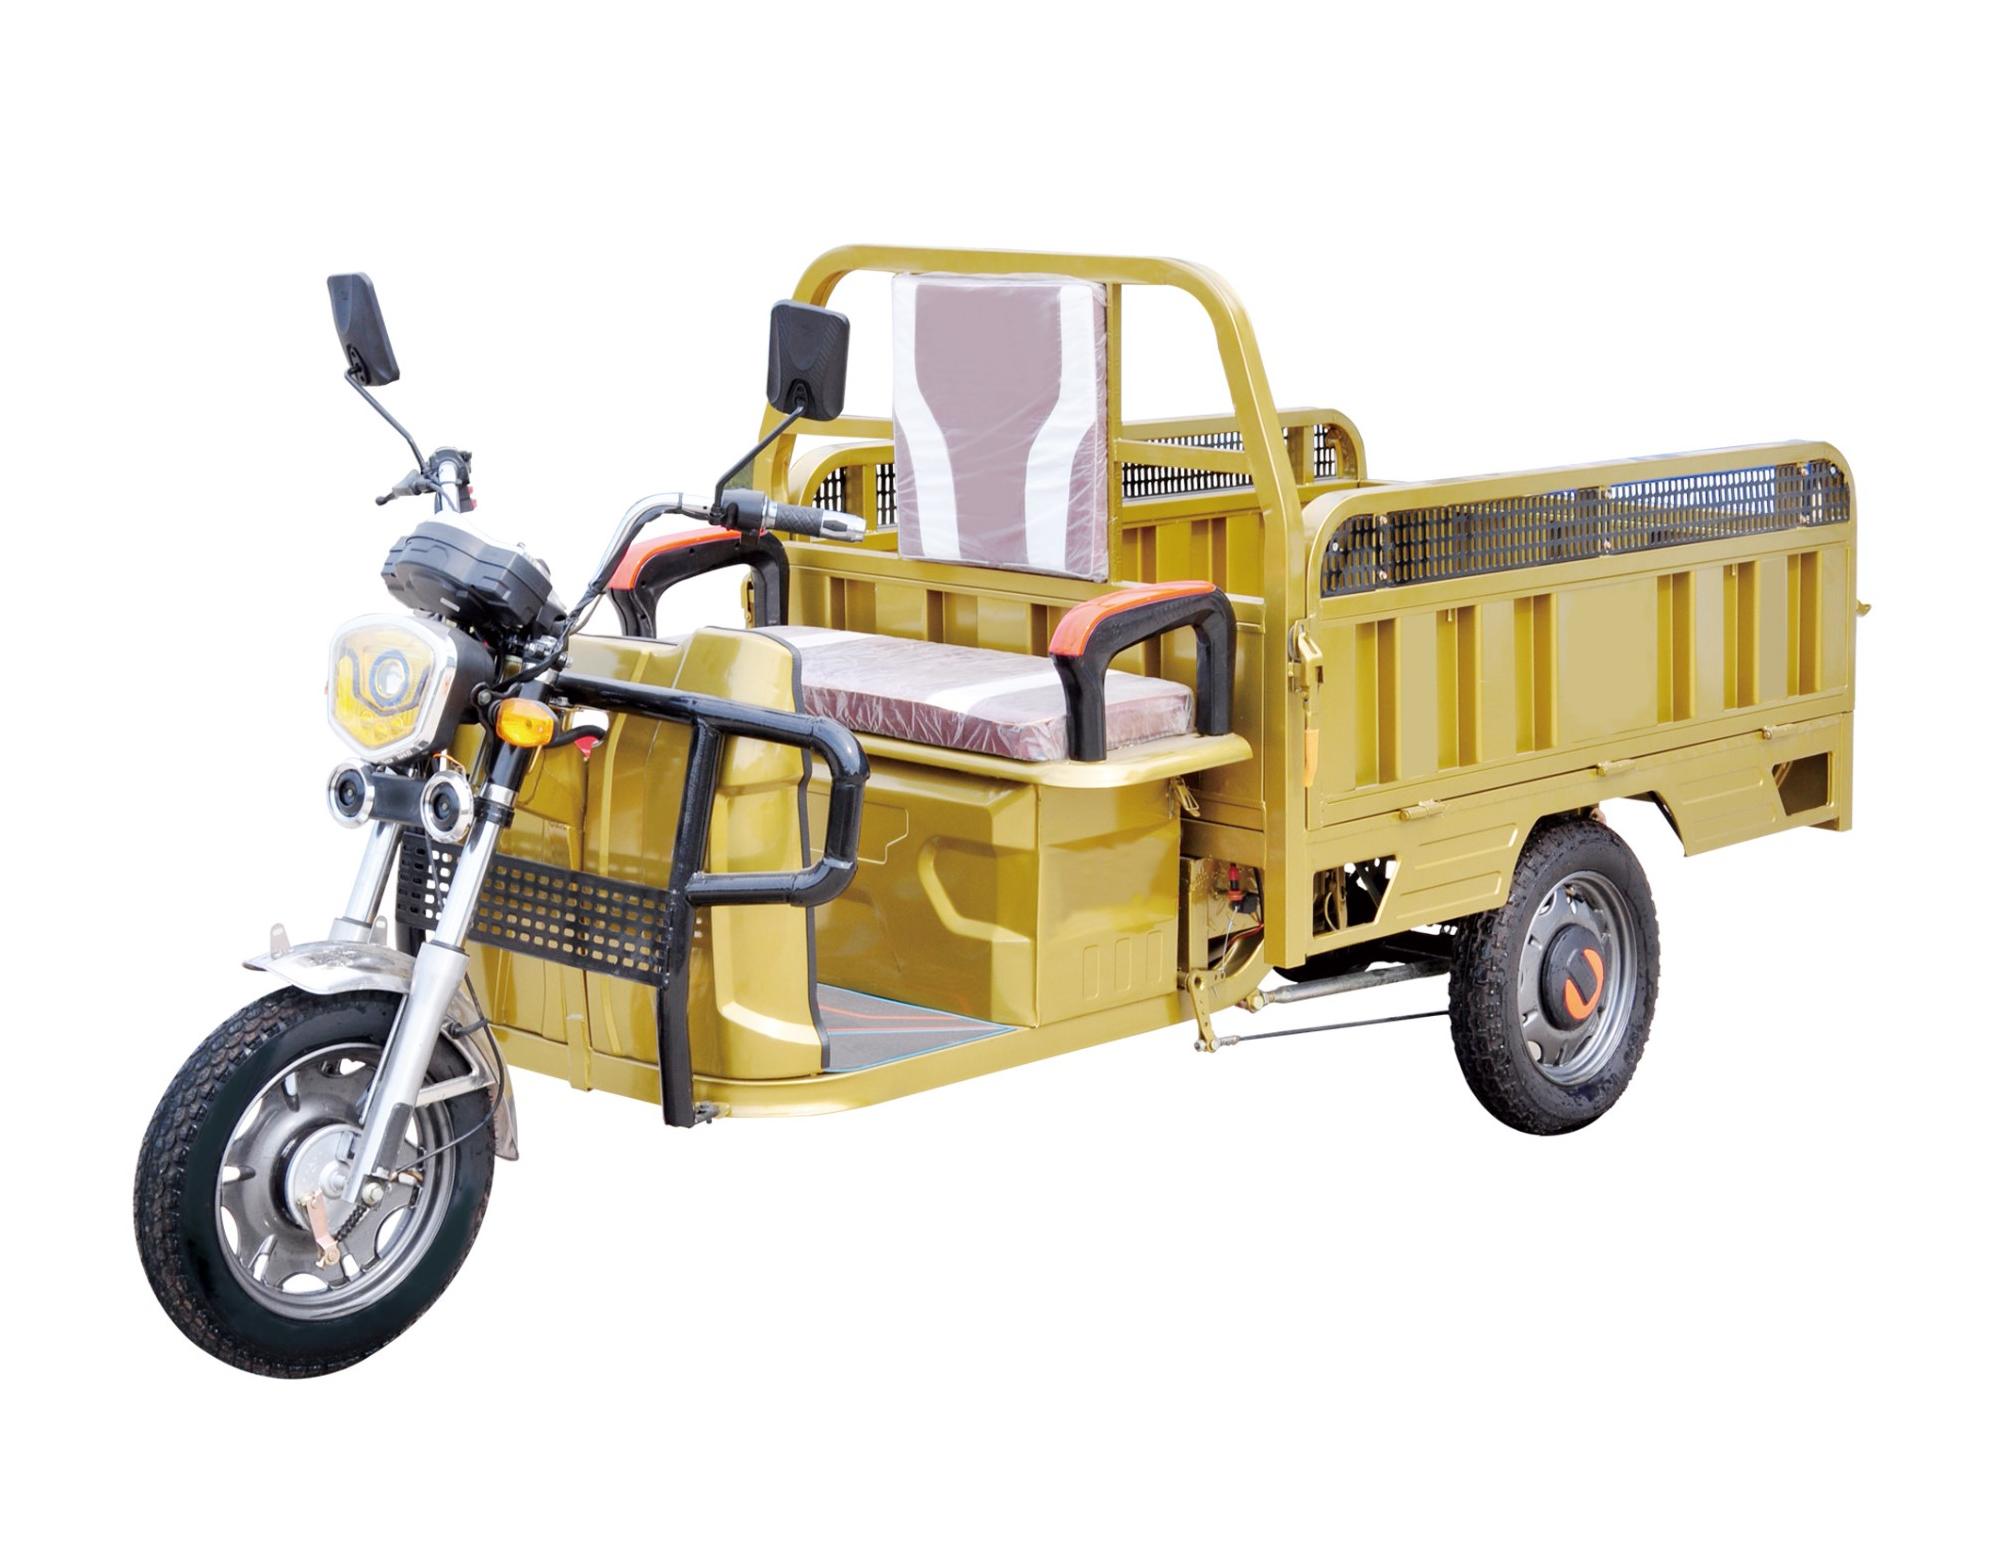 High quality Good Quality Cargo Electric Tricycle 3 Wheels Quotes,China Good Quality Cargo Electric Tricycle 3 Wheels Factory,Good Quality Cargo Electric Tricycle 3 Wheels Purchasing